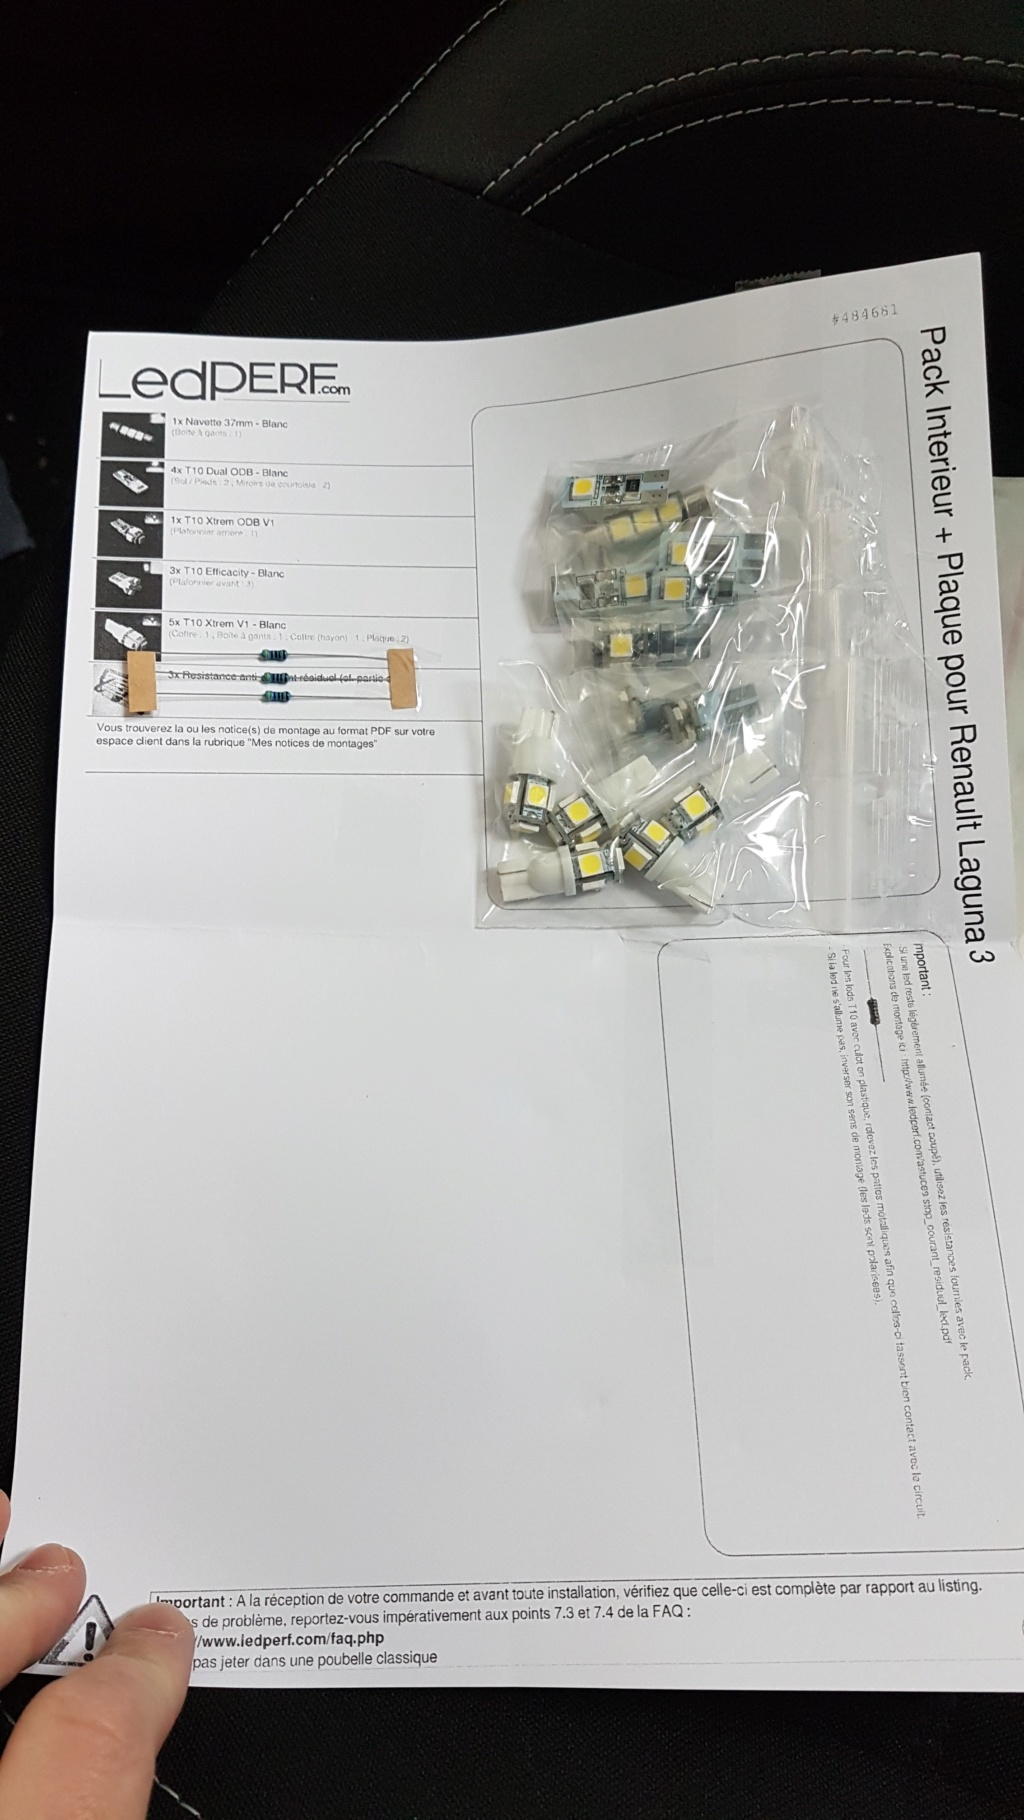 [Thibaut] Laguna III.3 Limited 1.5 dCi 110 - Page 2 20181210